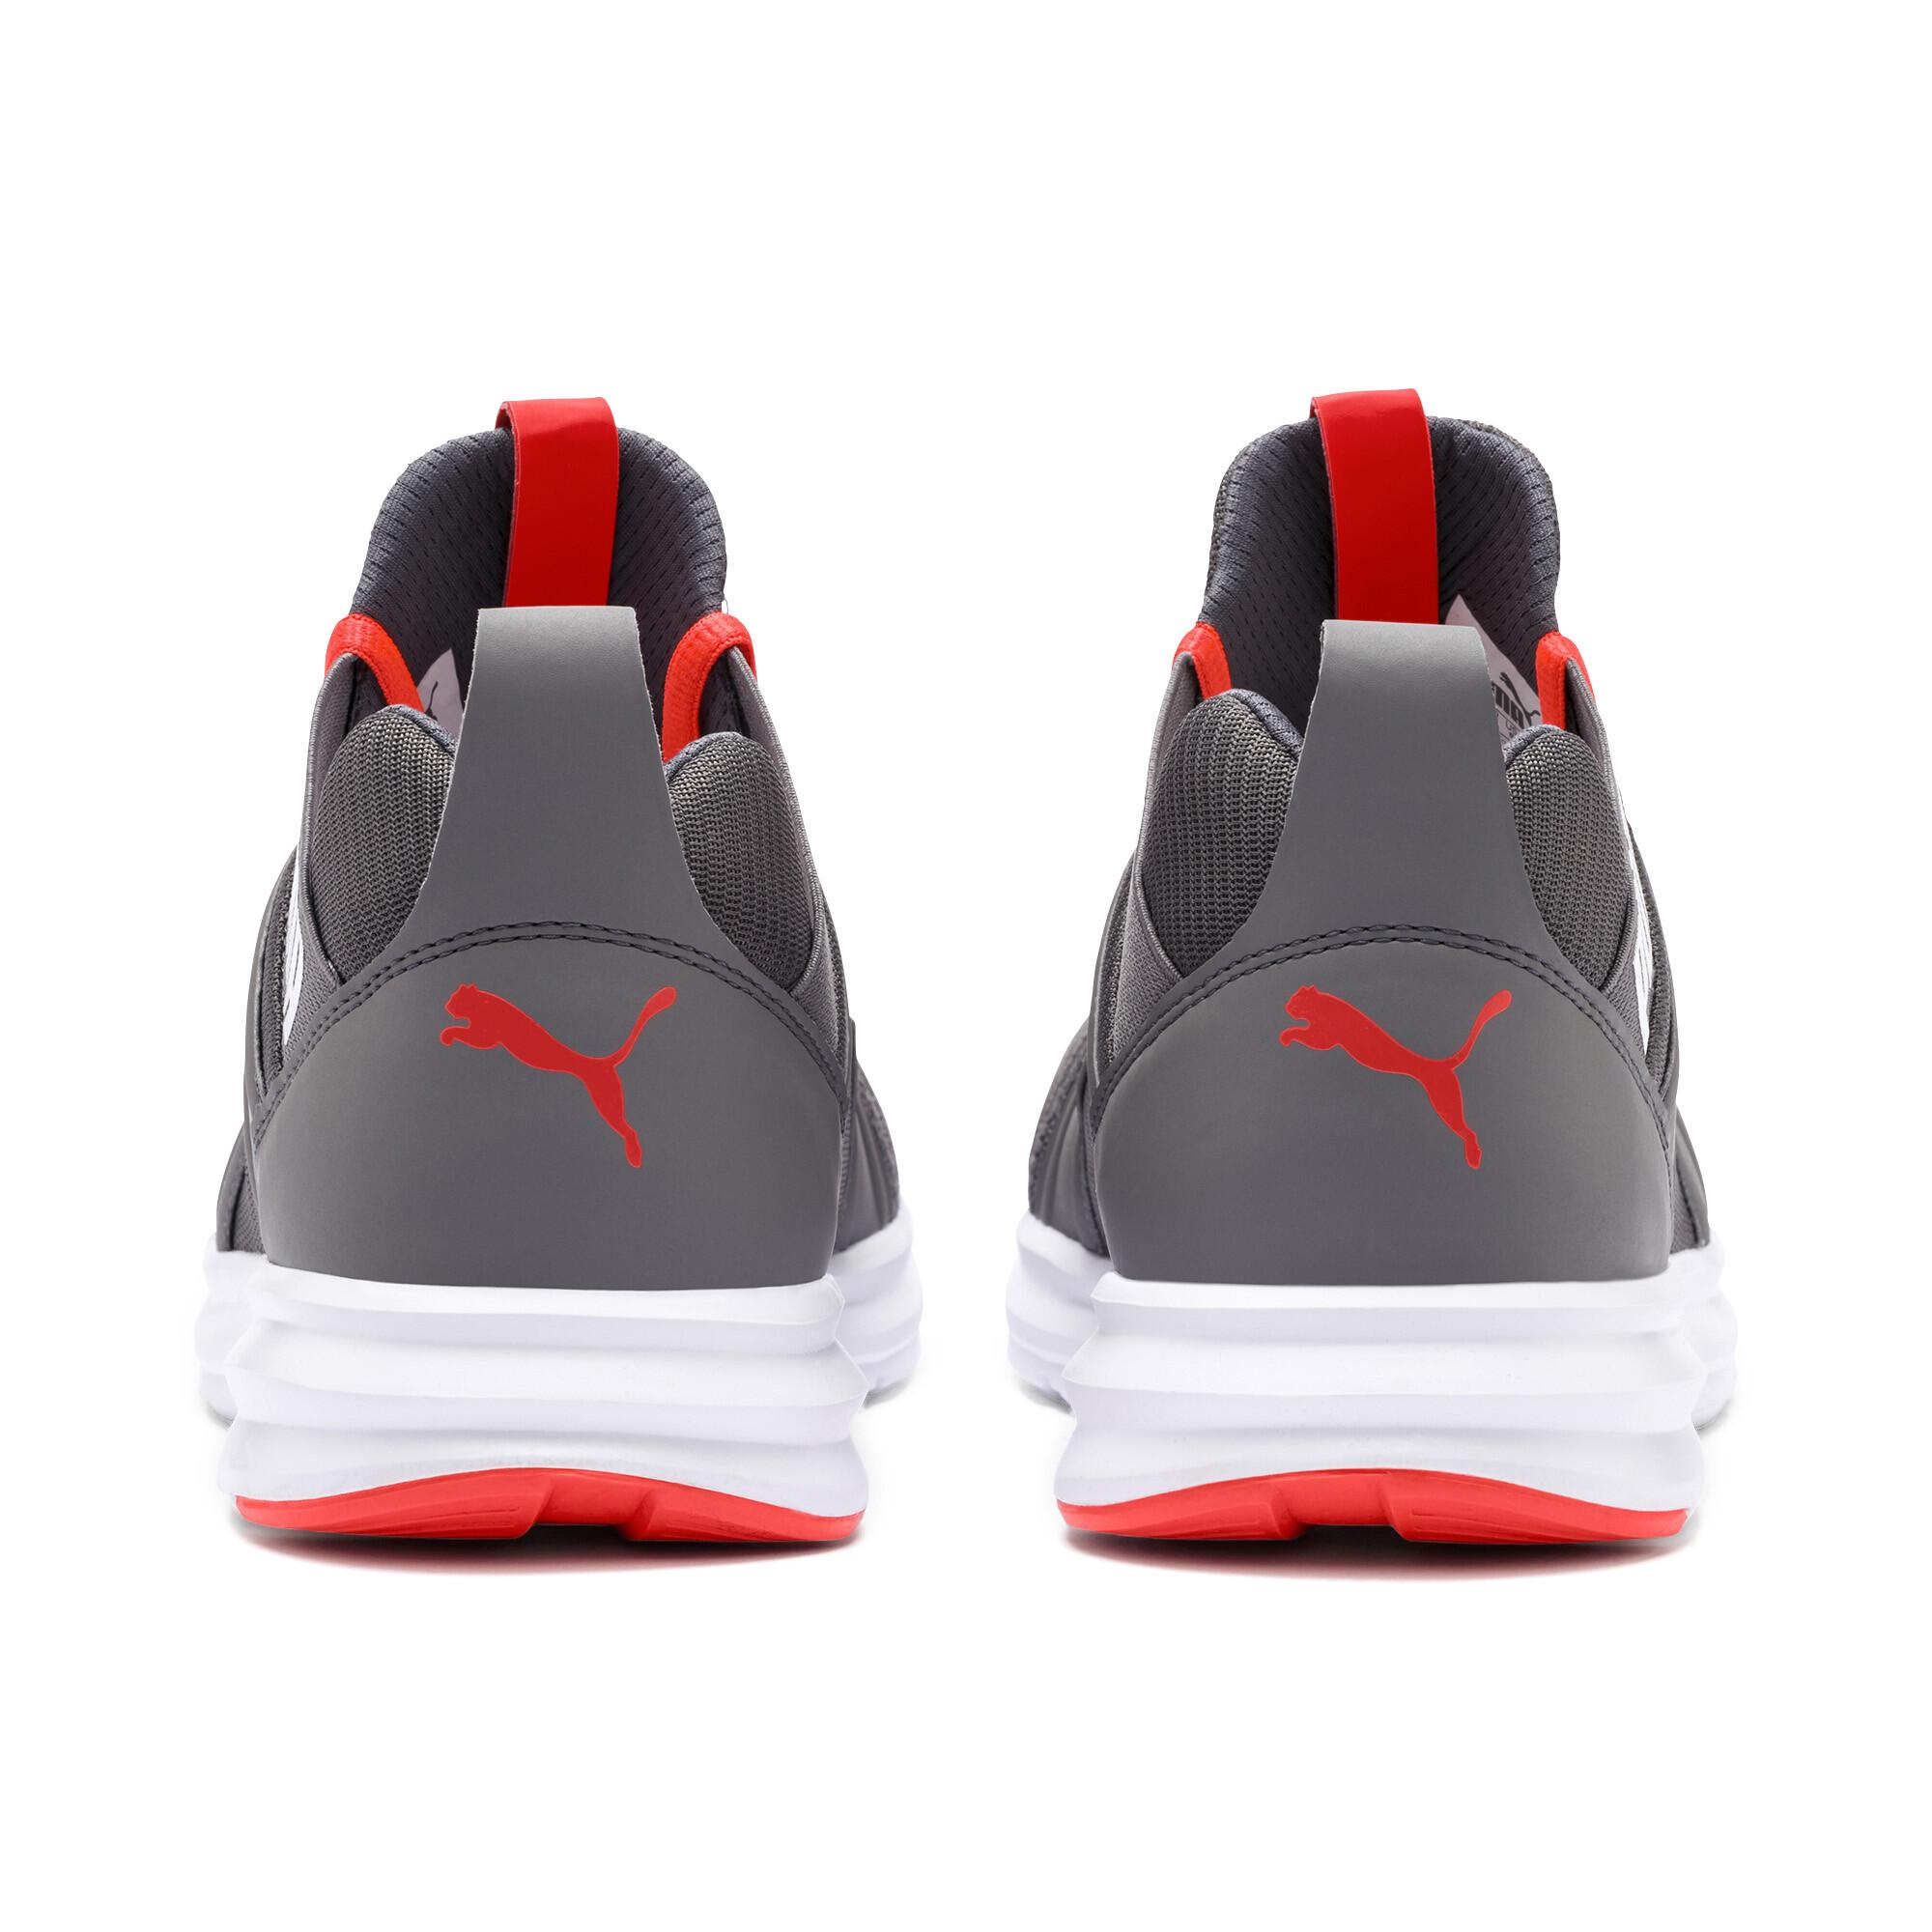 PUMA-Enzo-Geo-Men-s-Sneakers-Men-Shoe-Running thumbnail 9